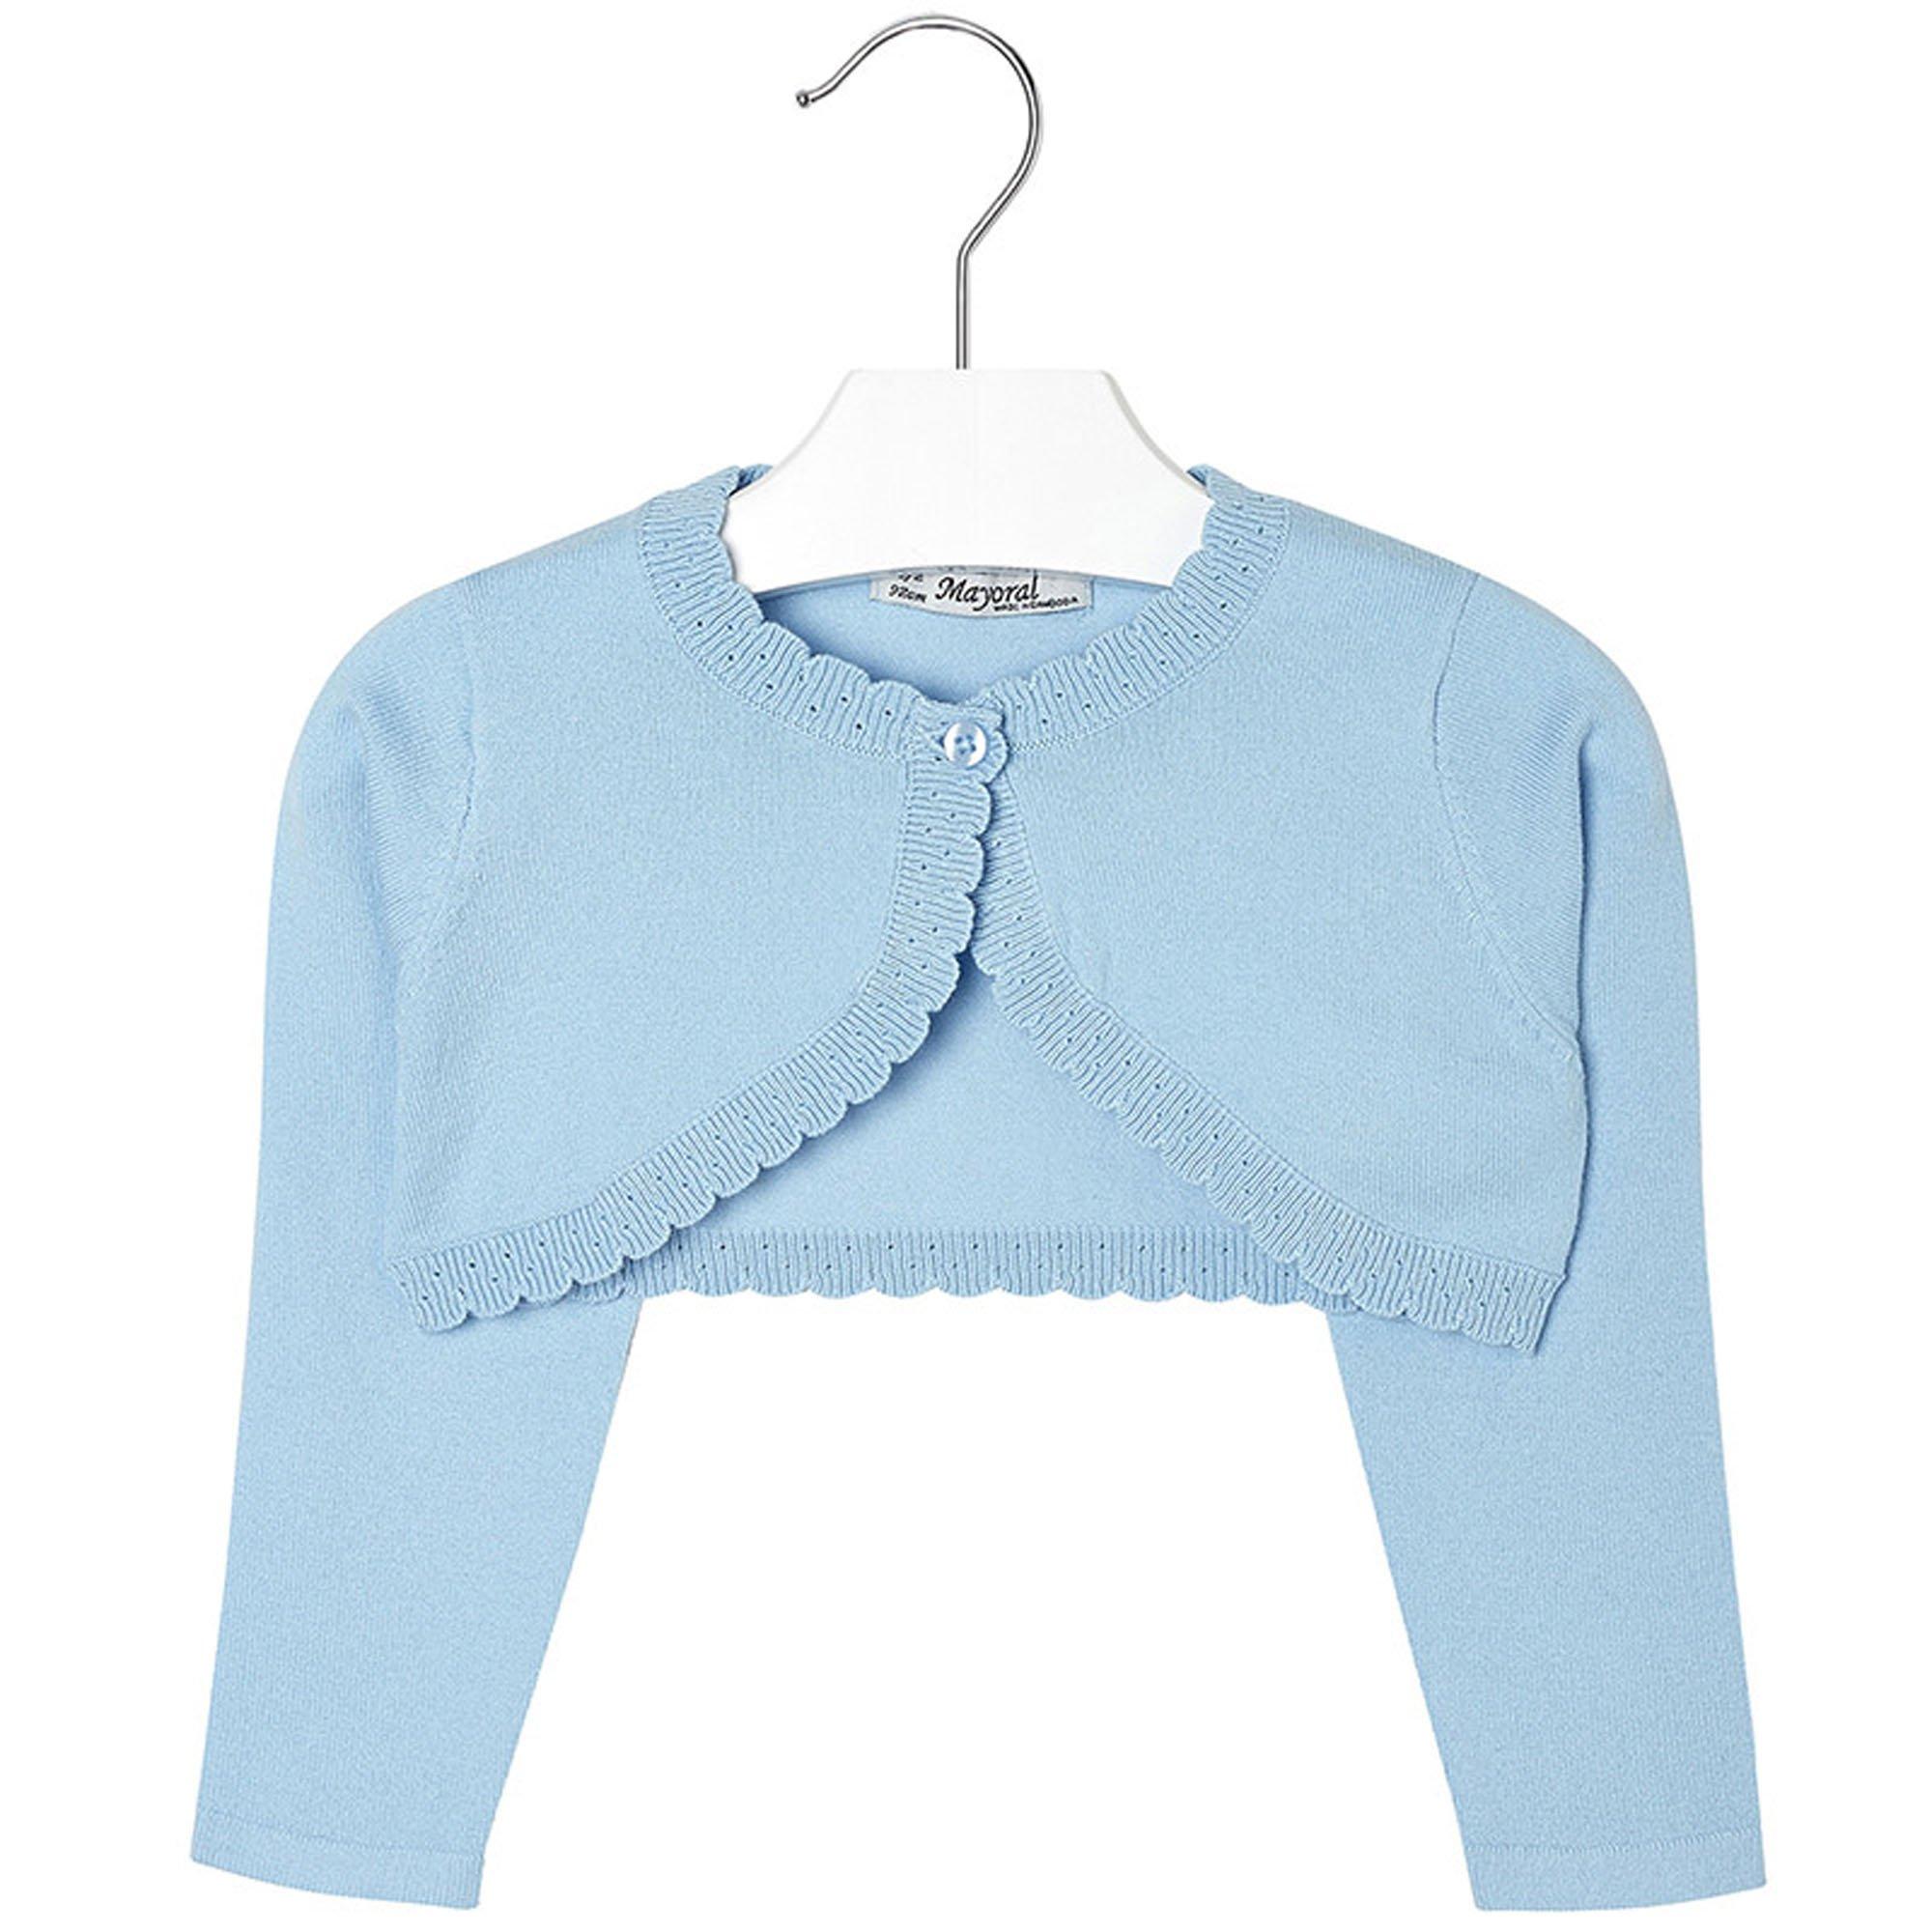 Mayoral Girls 2T-9 Light-Blue Scallop Edge Knit Shrug Cardigan Sweater, Light Blue,5